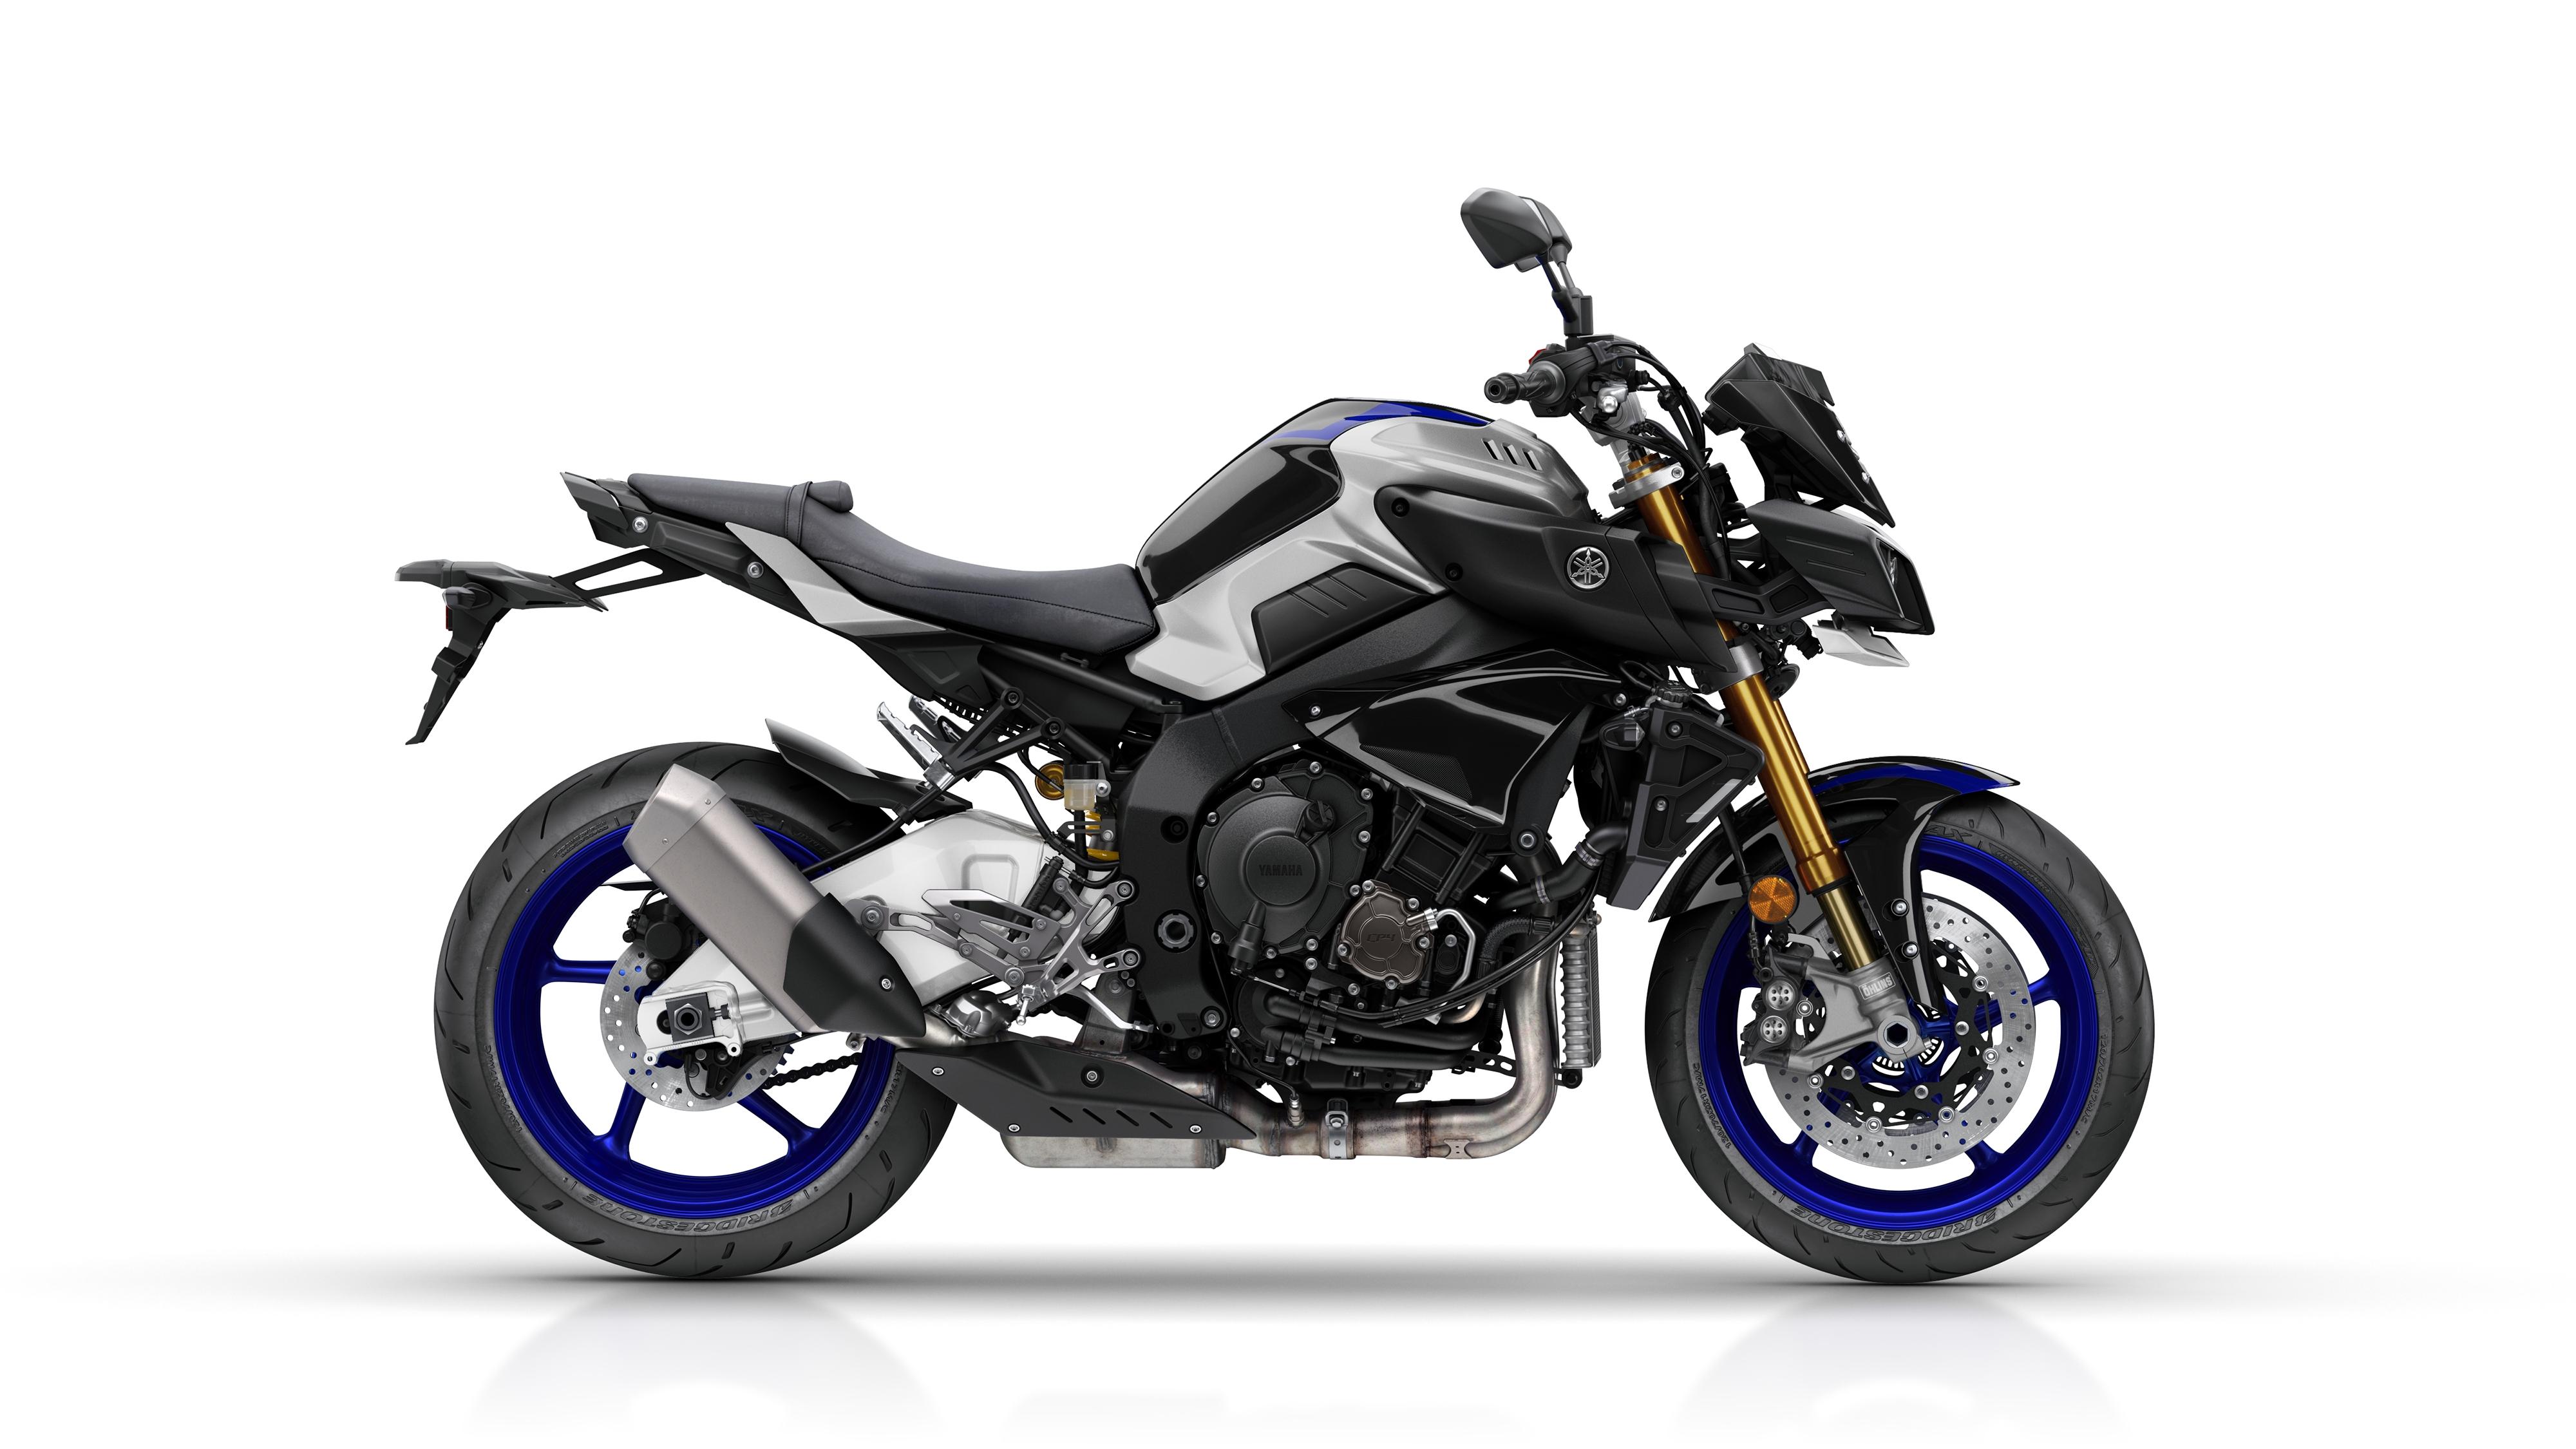 Yamaha reveals updated 2017 mt 10 and ne visordown for Yamaha mt10 price